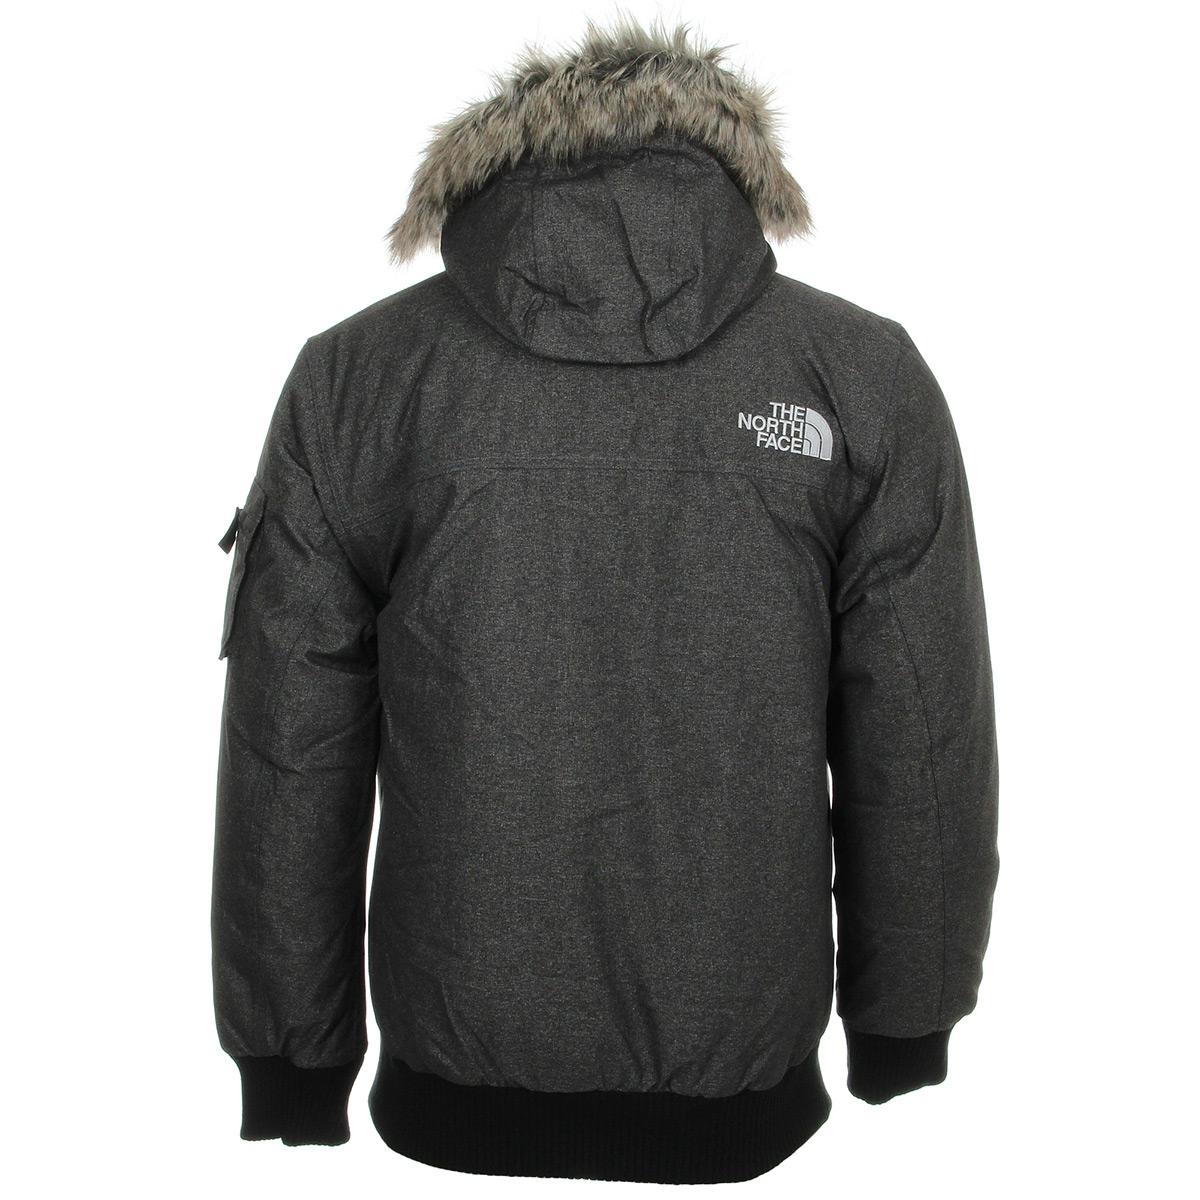 The North Face Gotham Jacket T0A8Q4JBU, Blousons homme